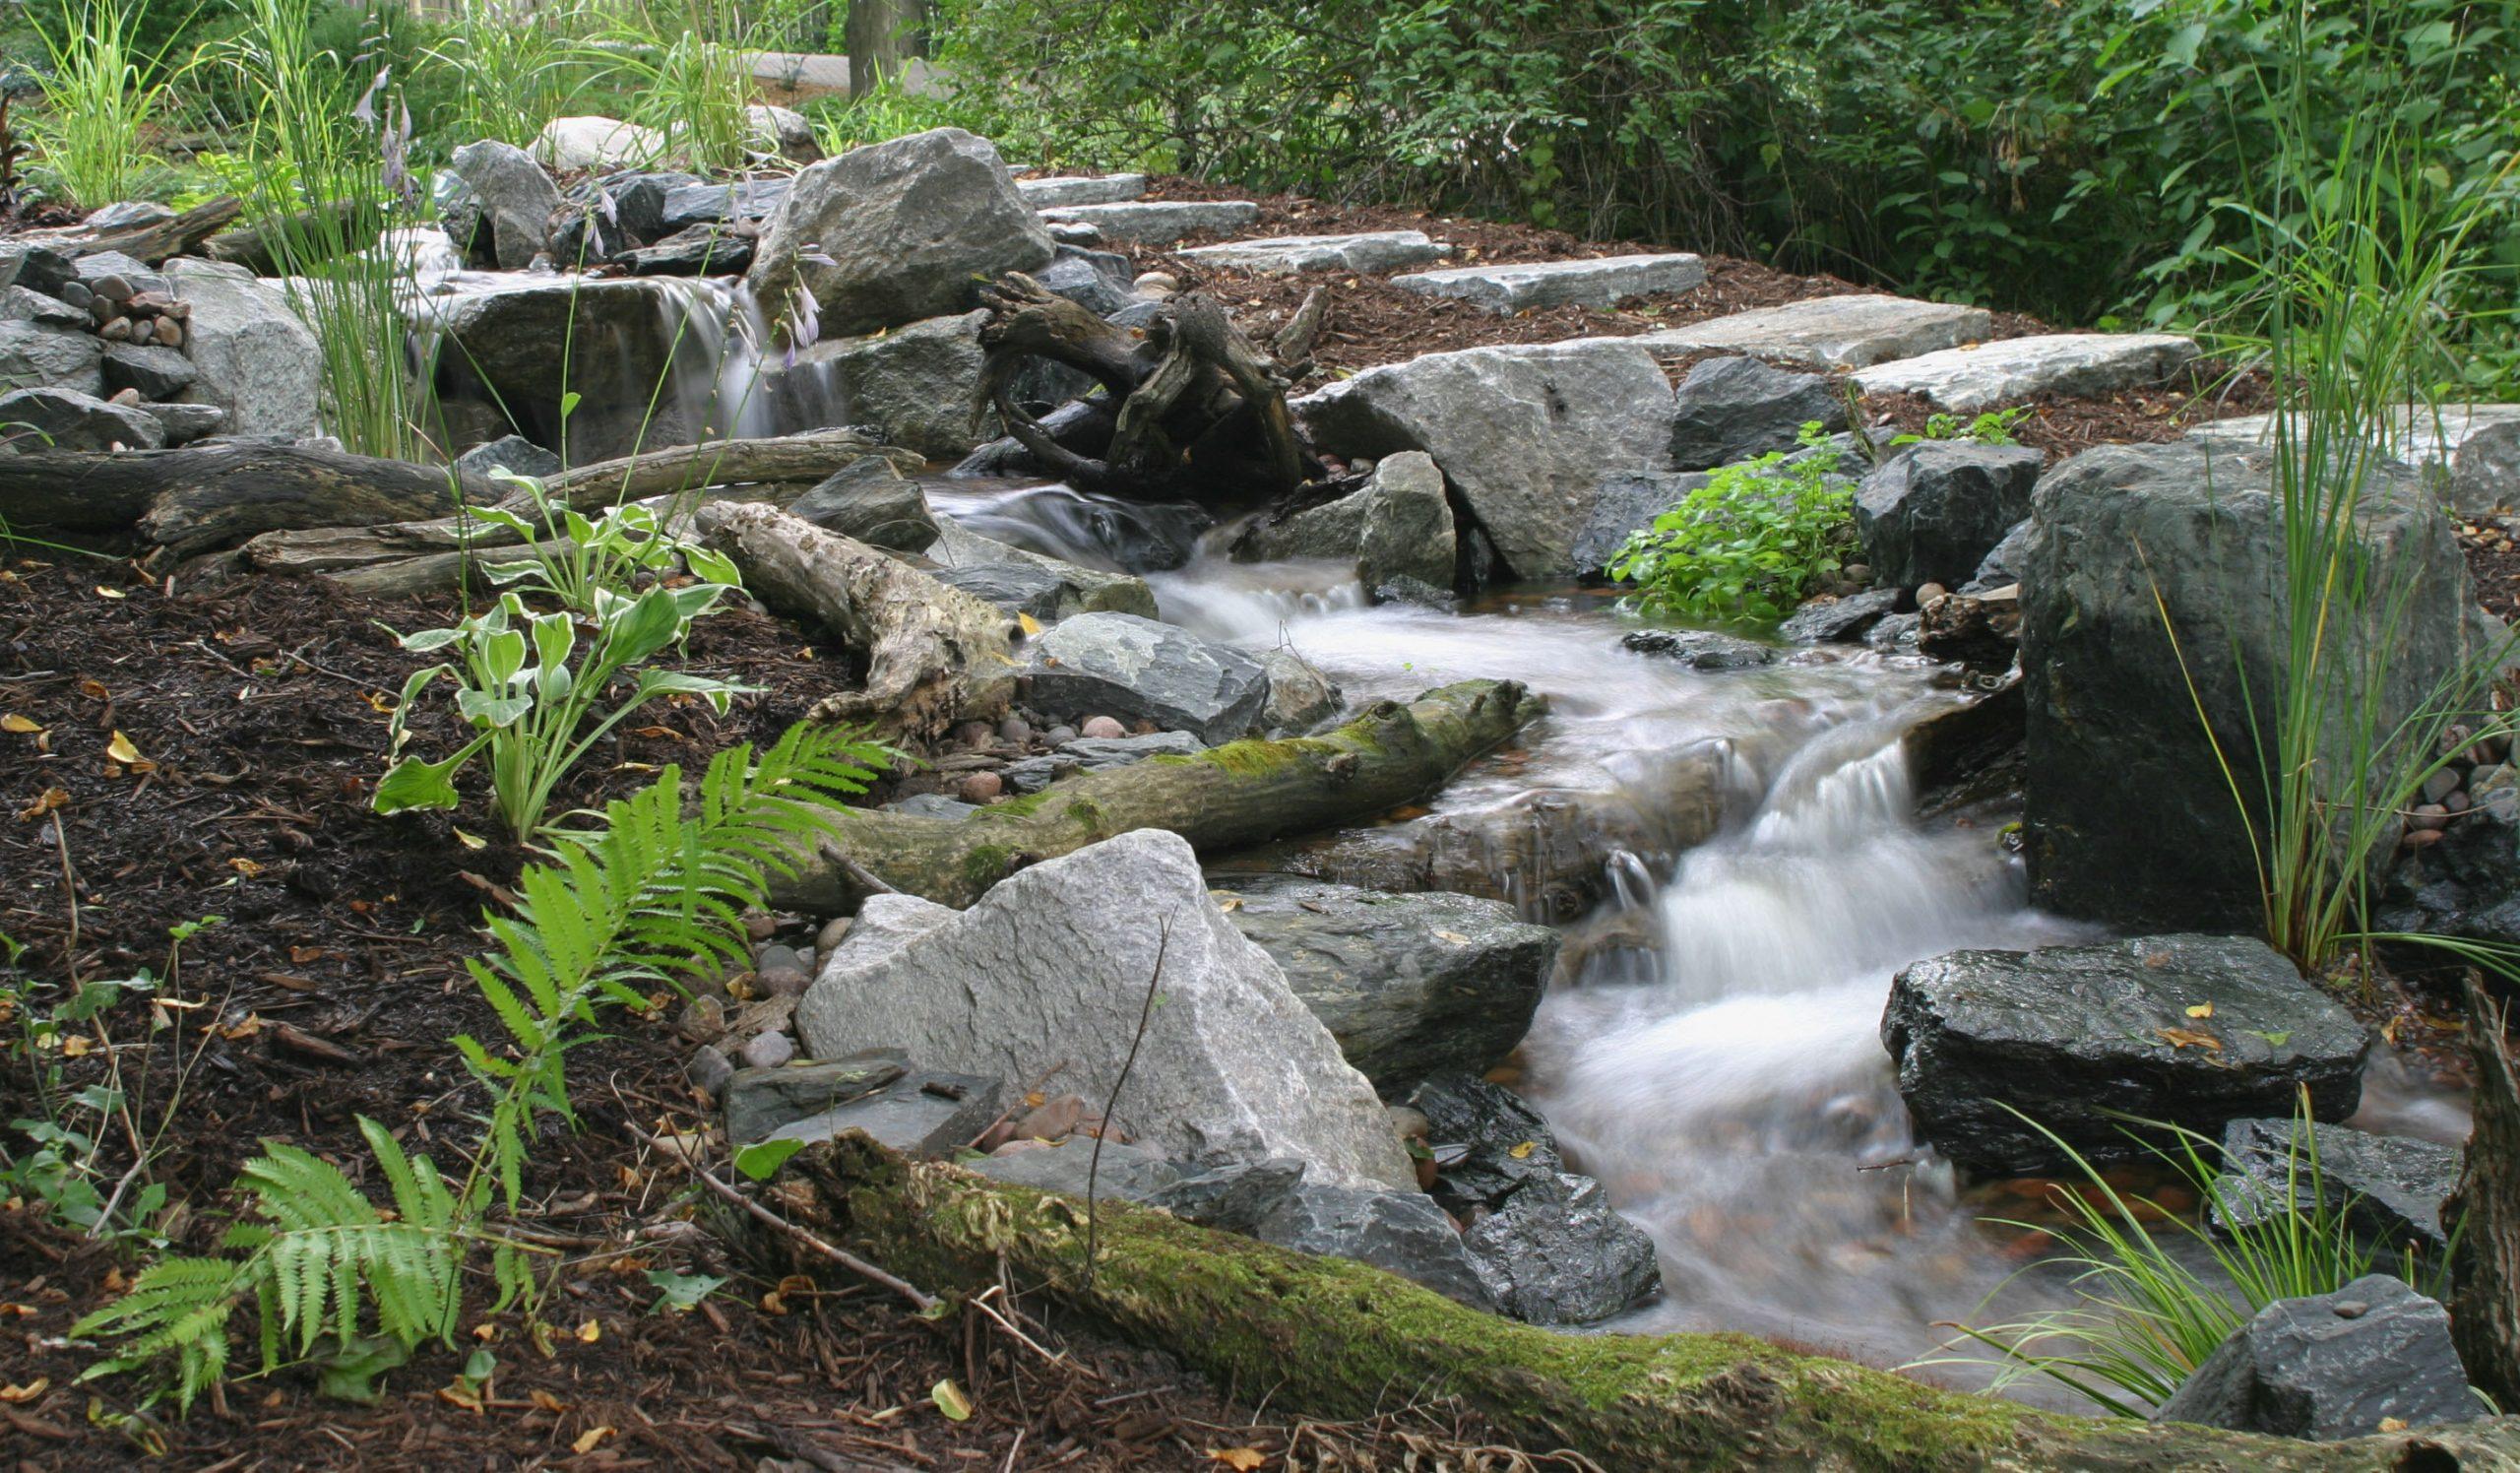 Aqua Blue Stones in Waterfall